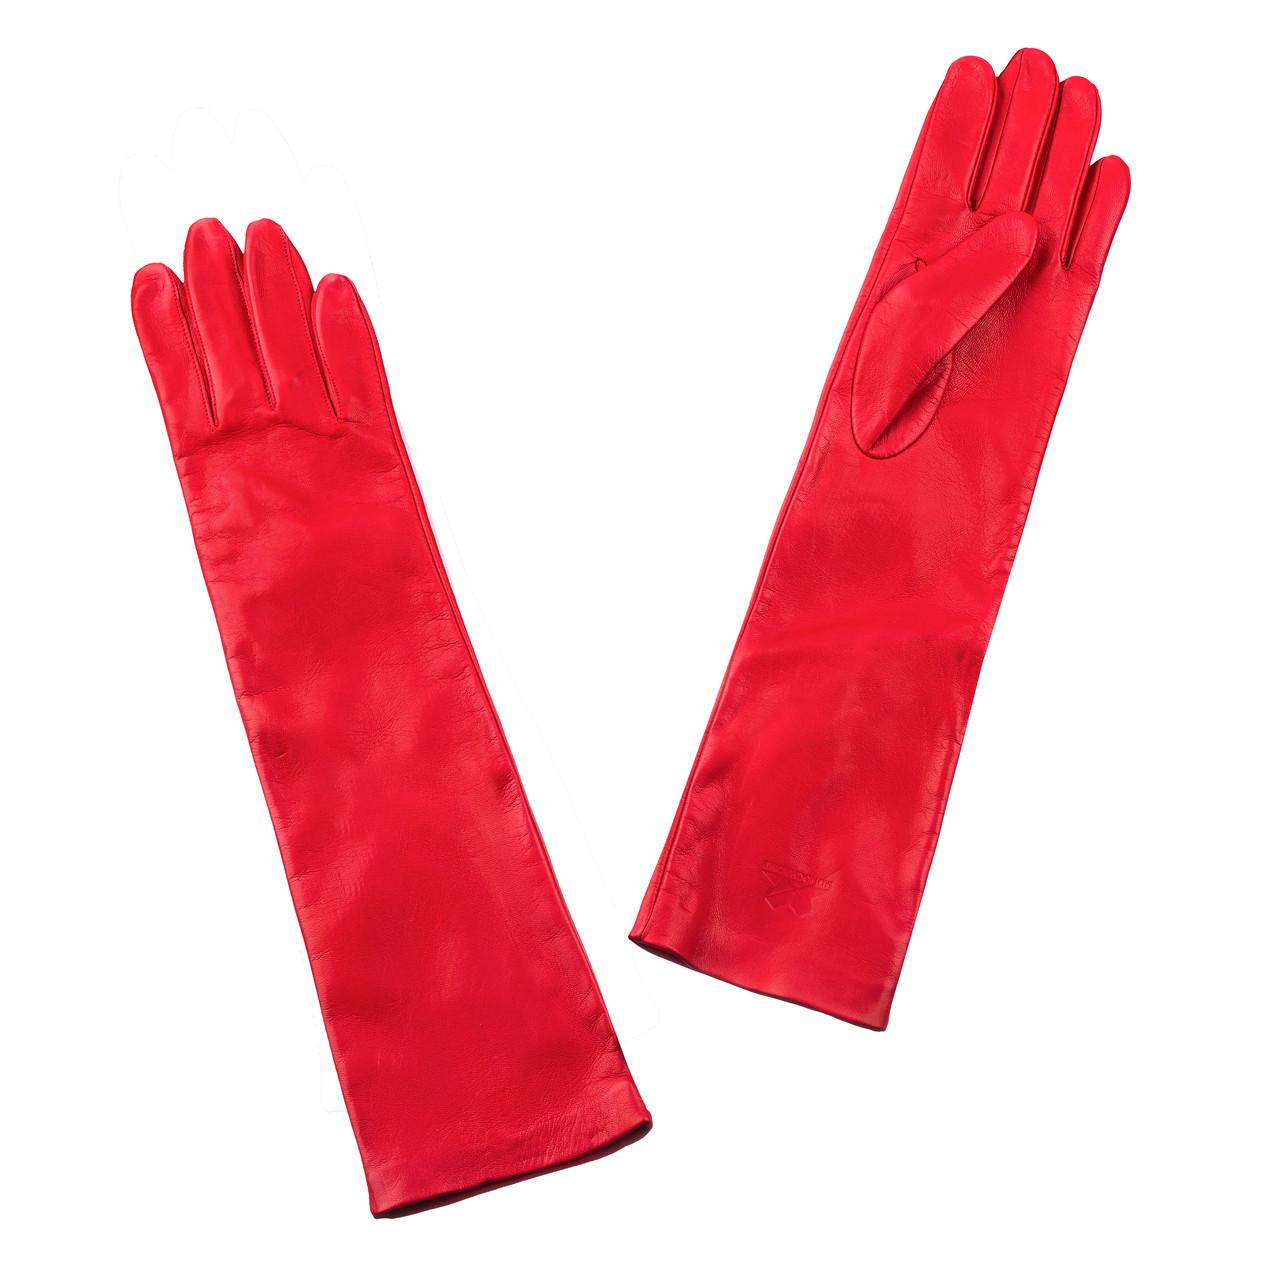 Перчатки The Monochrome 7 кожаные Красные (SS_1869a-red)